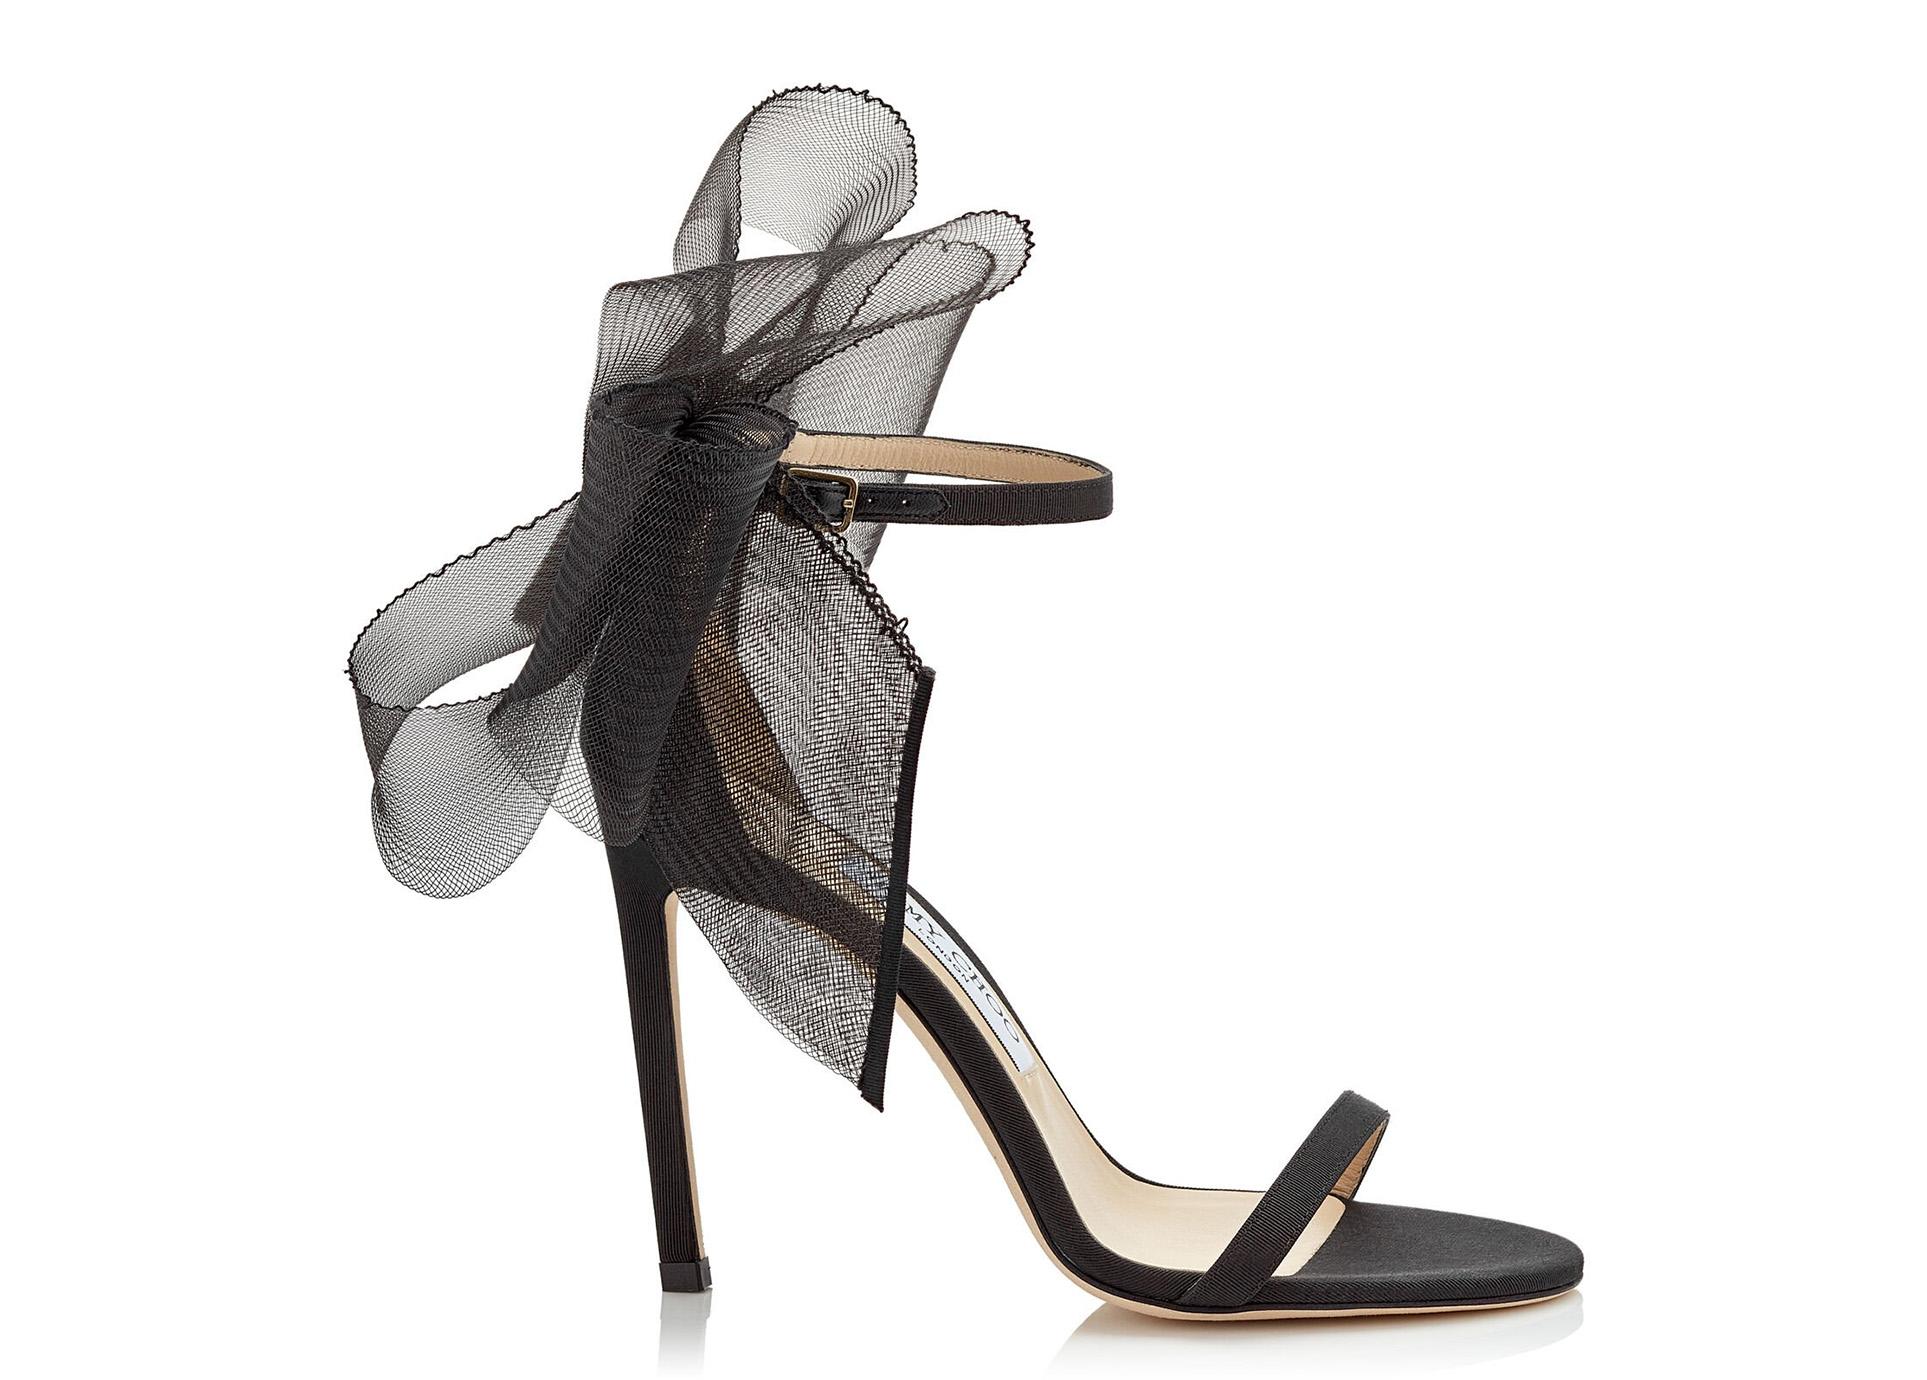 sandalias Aveline de Jimmy Choo